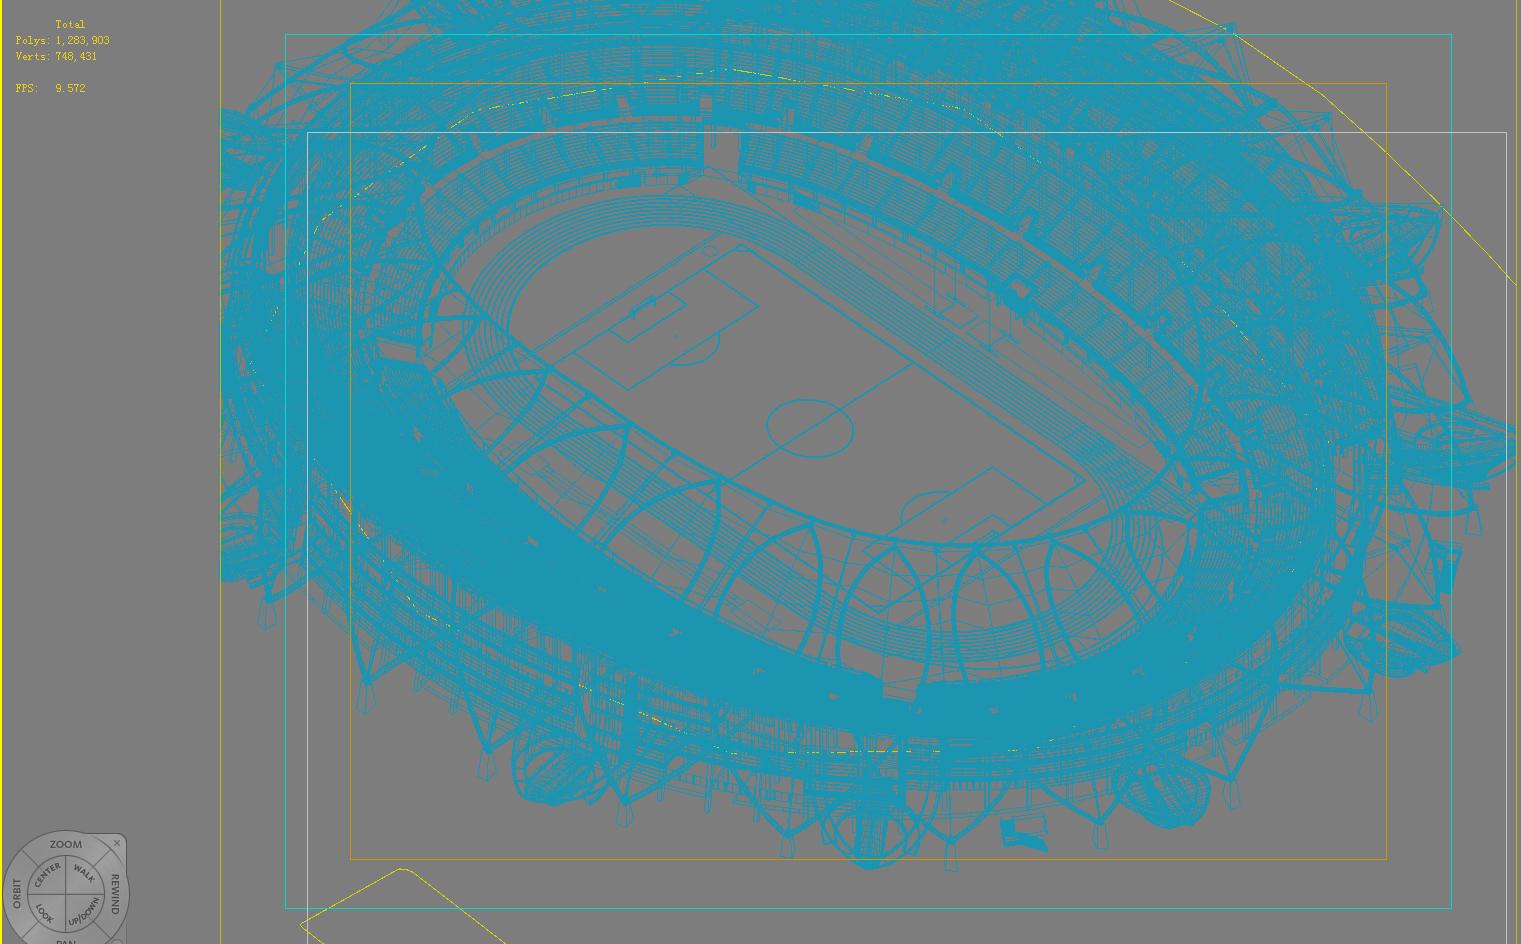 stadiumi i madh 008 3d model 3ds max 98269